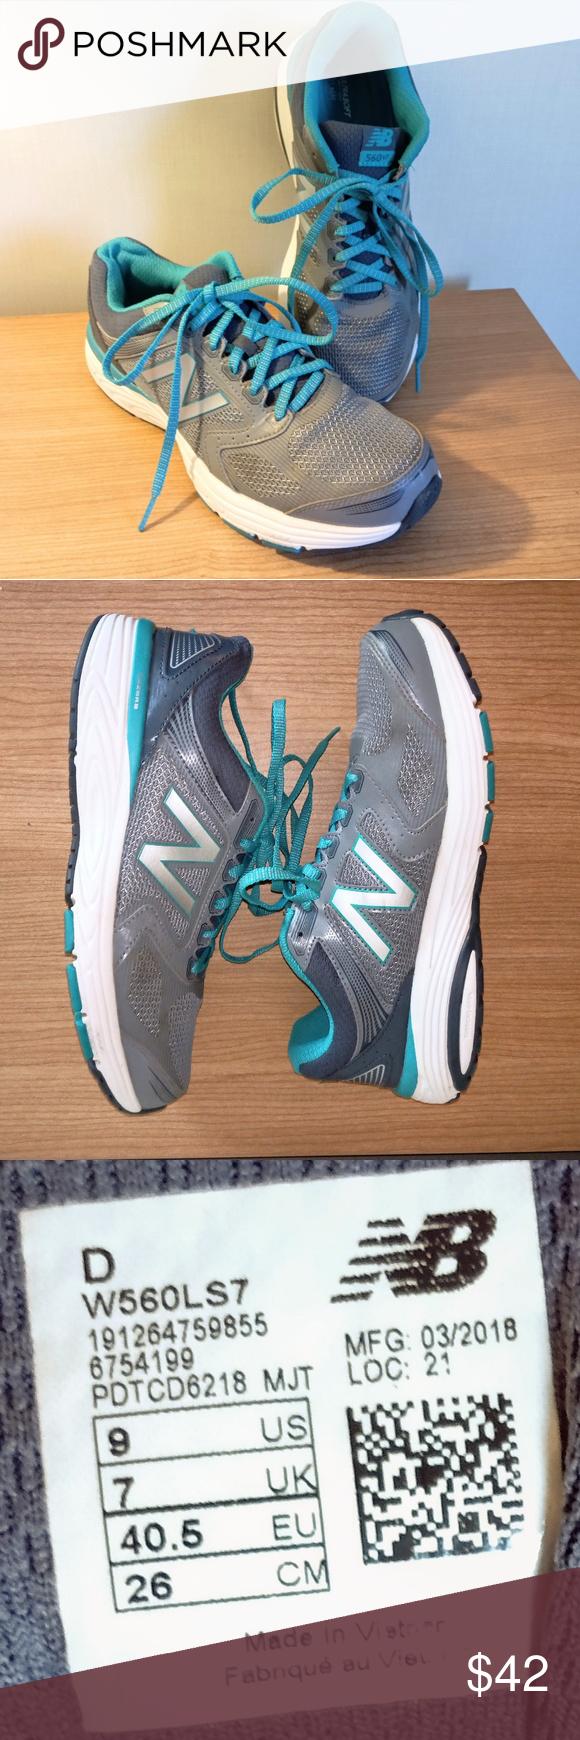 New Balance 560V7 Women's running shoes